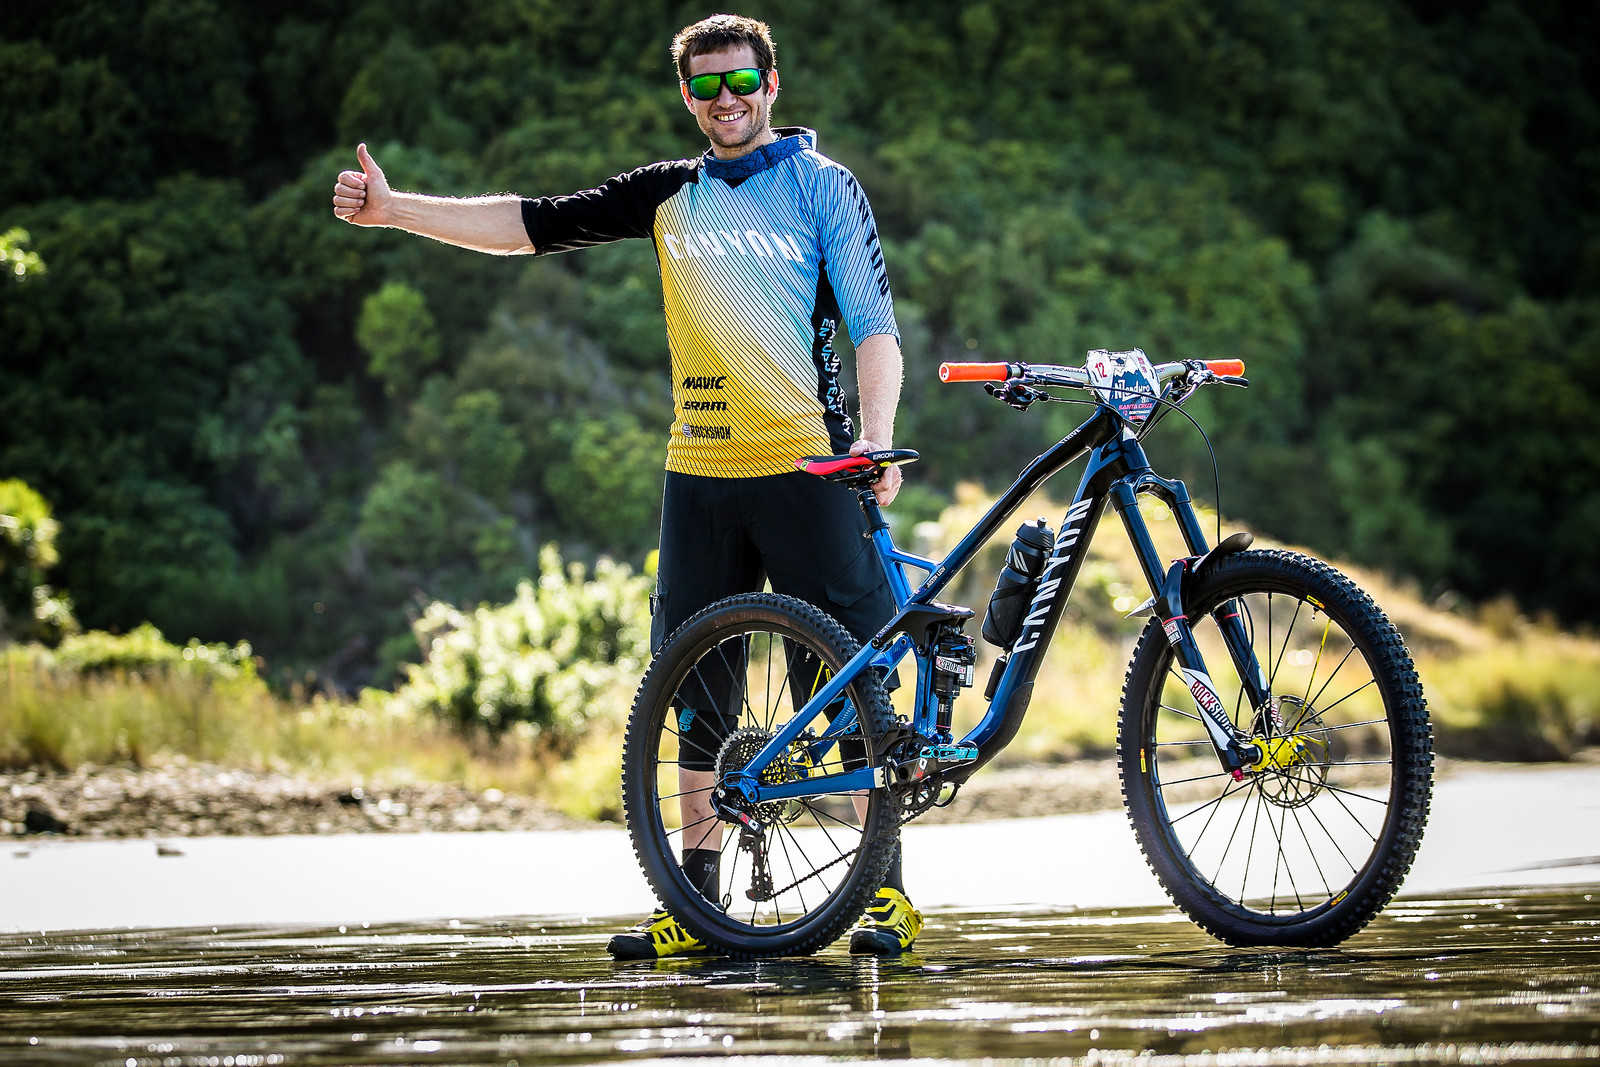 2017 NZ Enduro Pro Bikes - Justin Leov's Canyon Strive - 2017 NZ Enduro Pro Bikes - They Wreck 'Em, We Check 'Em - Mountain Biking Pictures - Vital MTB